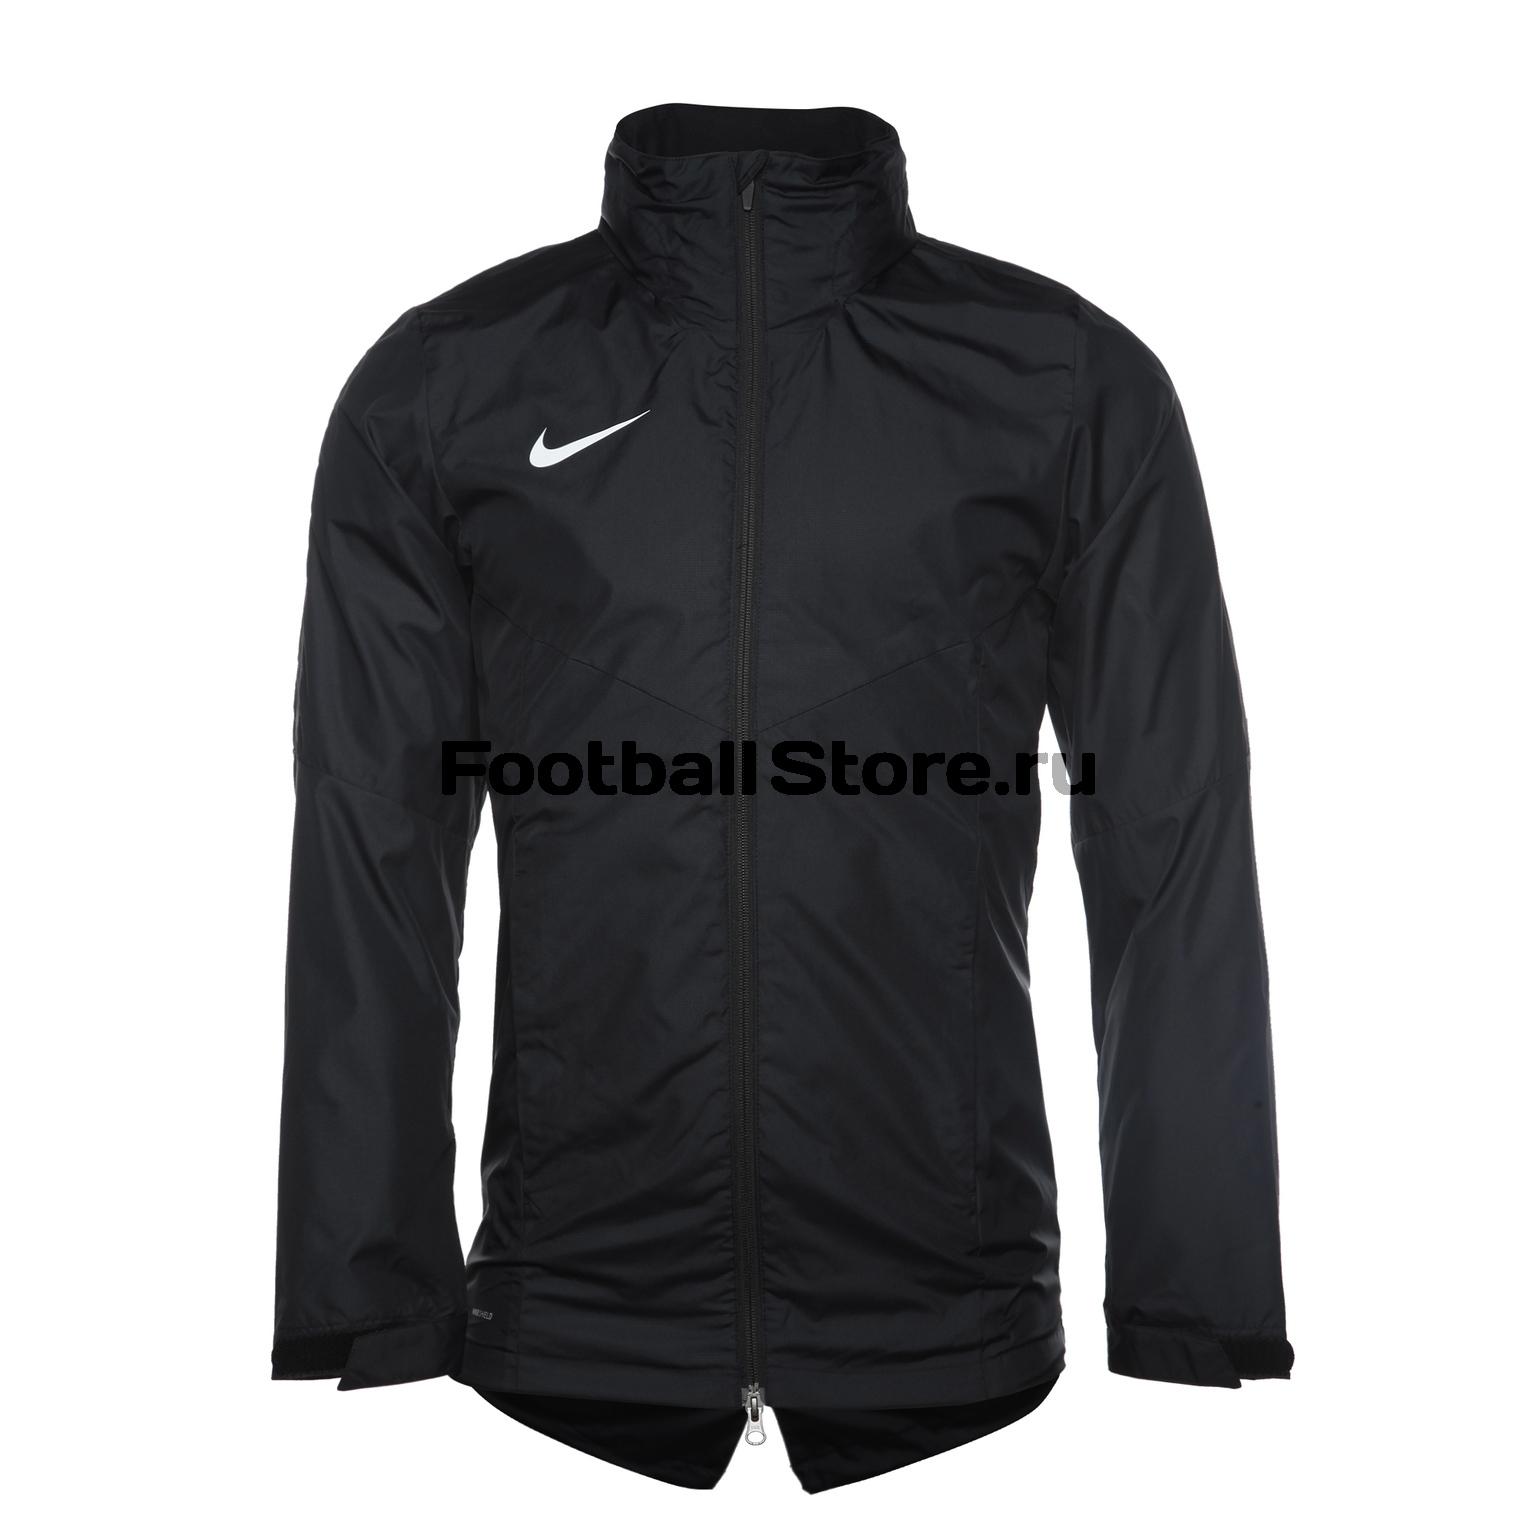 Куртка Nike Academy 18 Rain Jacket 893796-010 куртка спортивная nike guild 550 jacket 693529 657